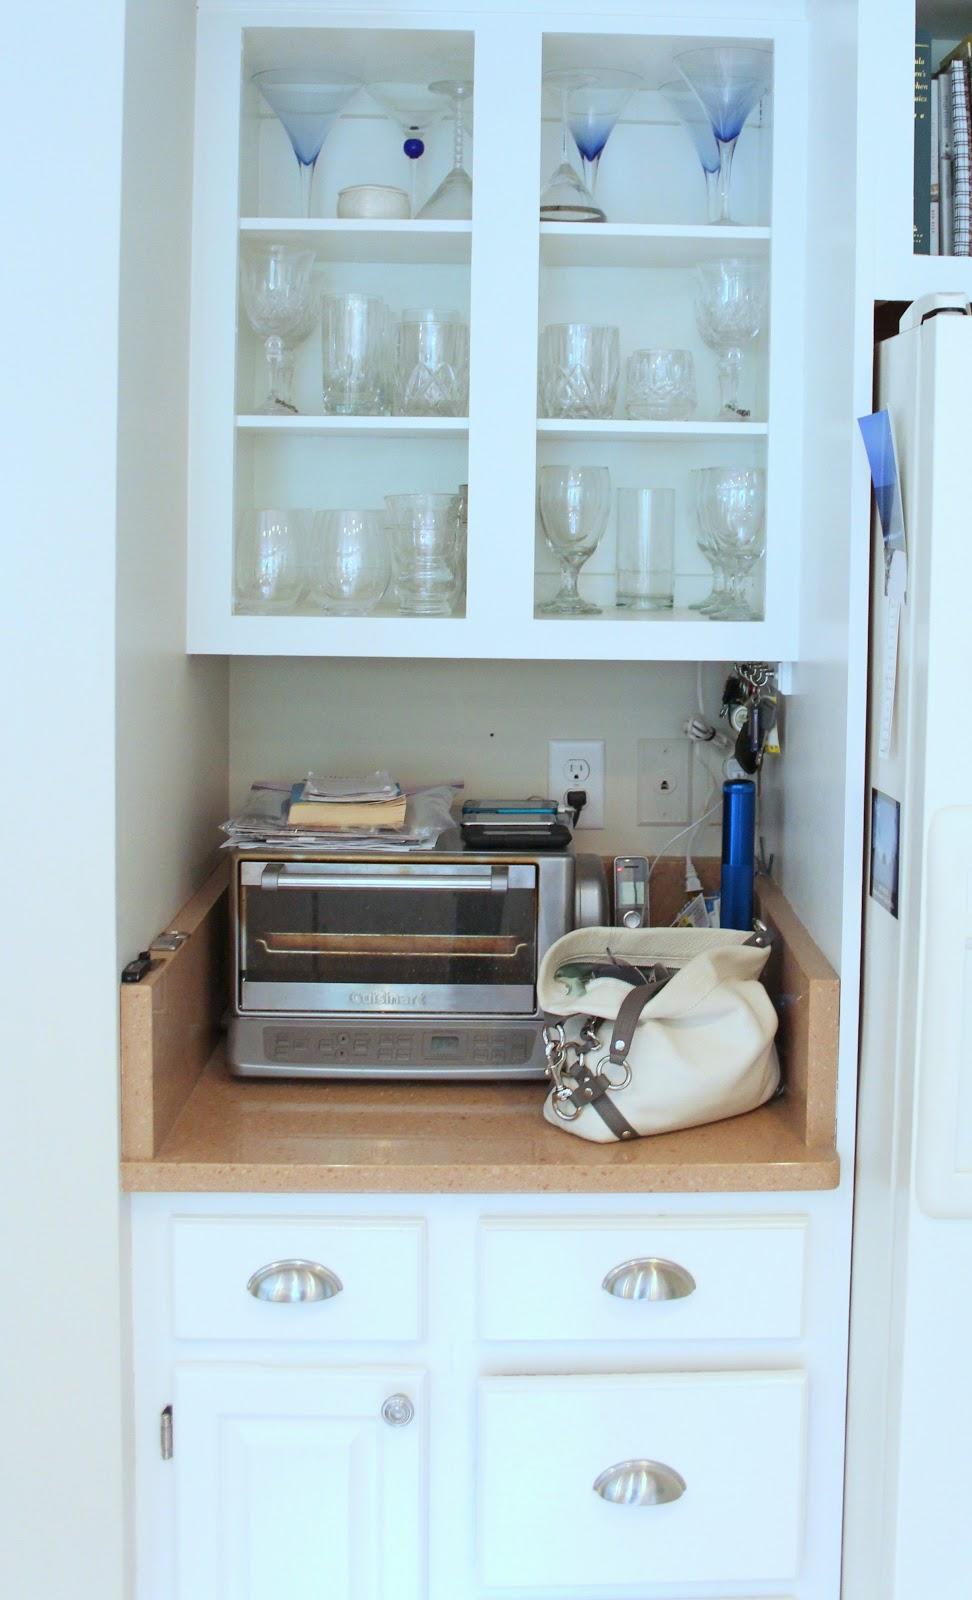 Designated Kitchen Work Stations - Shine Your Light